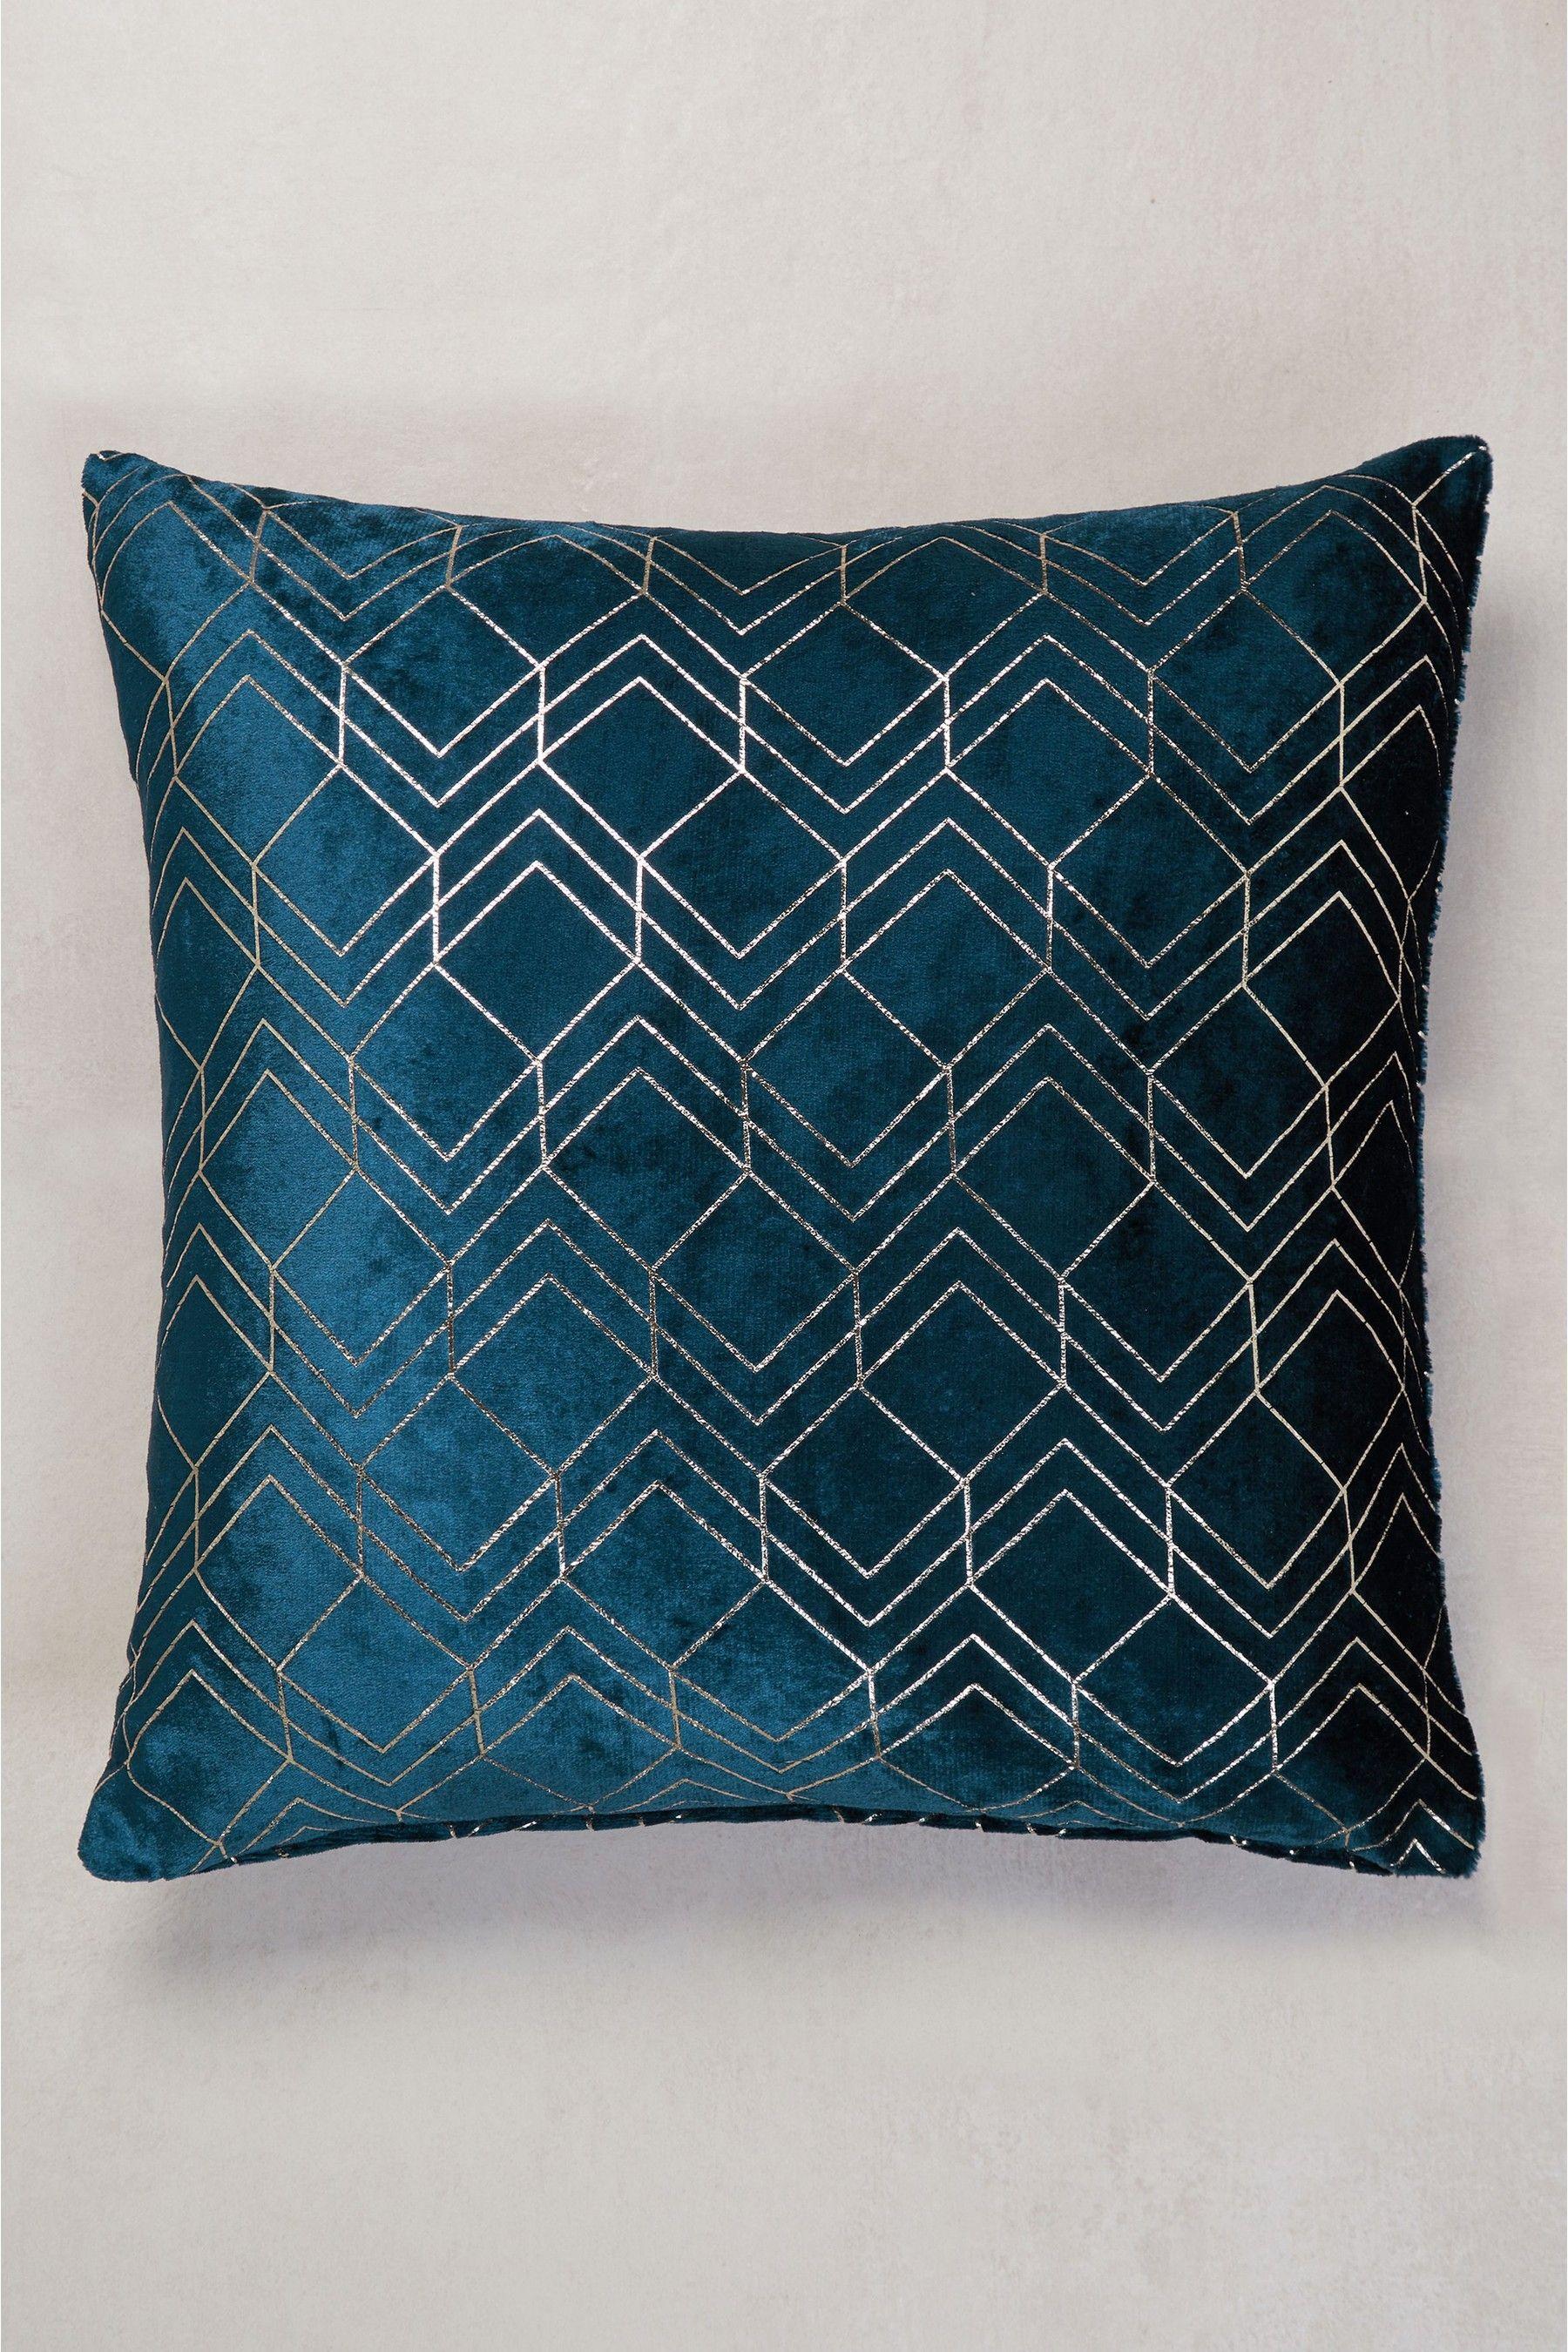 Next Metallic Velvet Geo Cushion - Blue   Products in 2019 ...